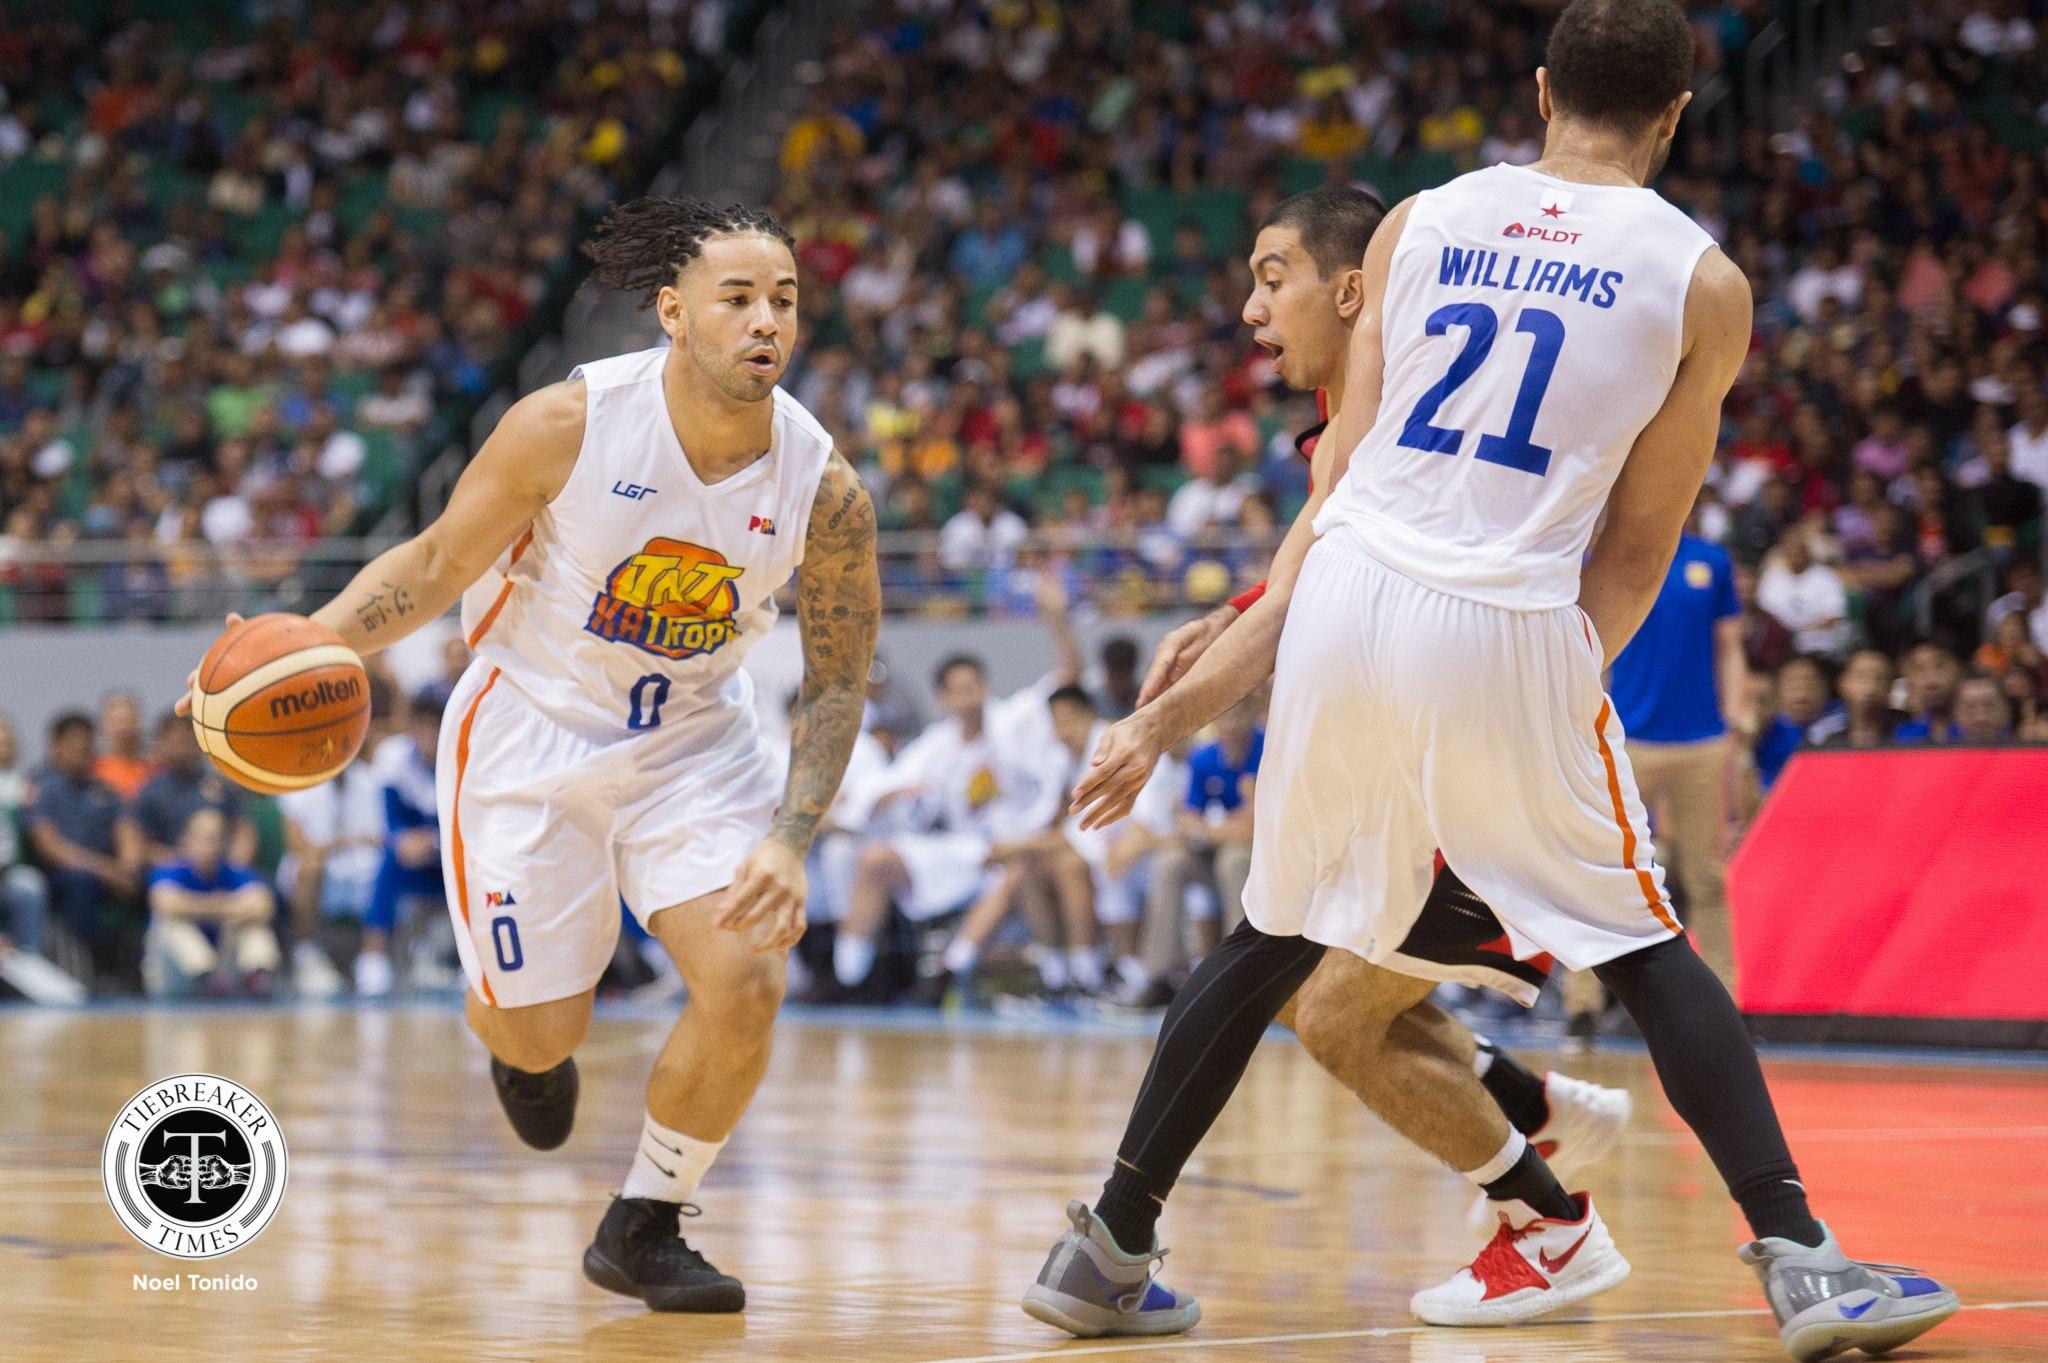 Tiebreaker Times Brian Heruela glad to make immediate impact in TNT debut Basketball News PBA  TNT Katropa PBA Season 44 Brian Heruela 2019 PBA Philippine Cup